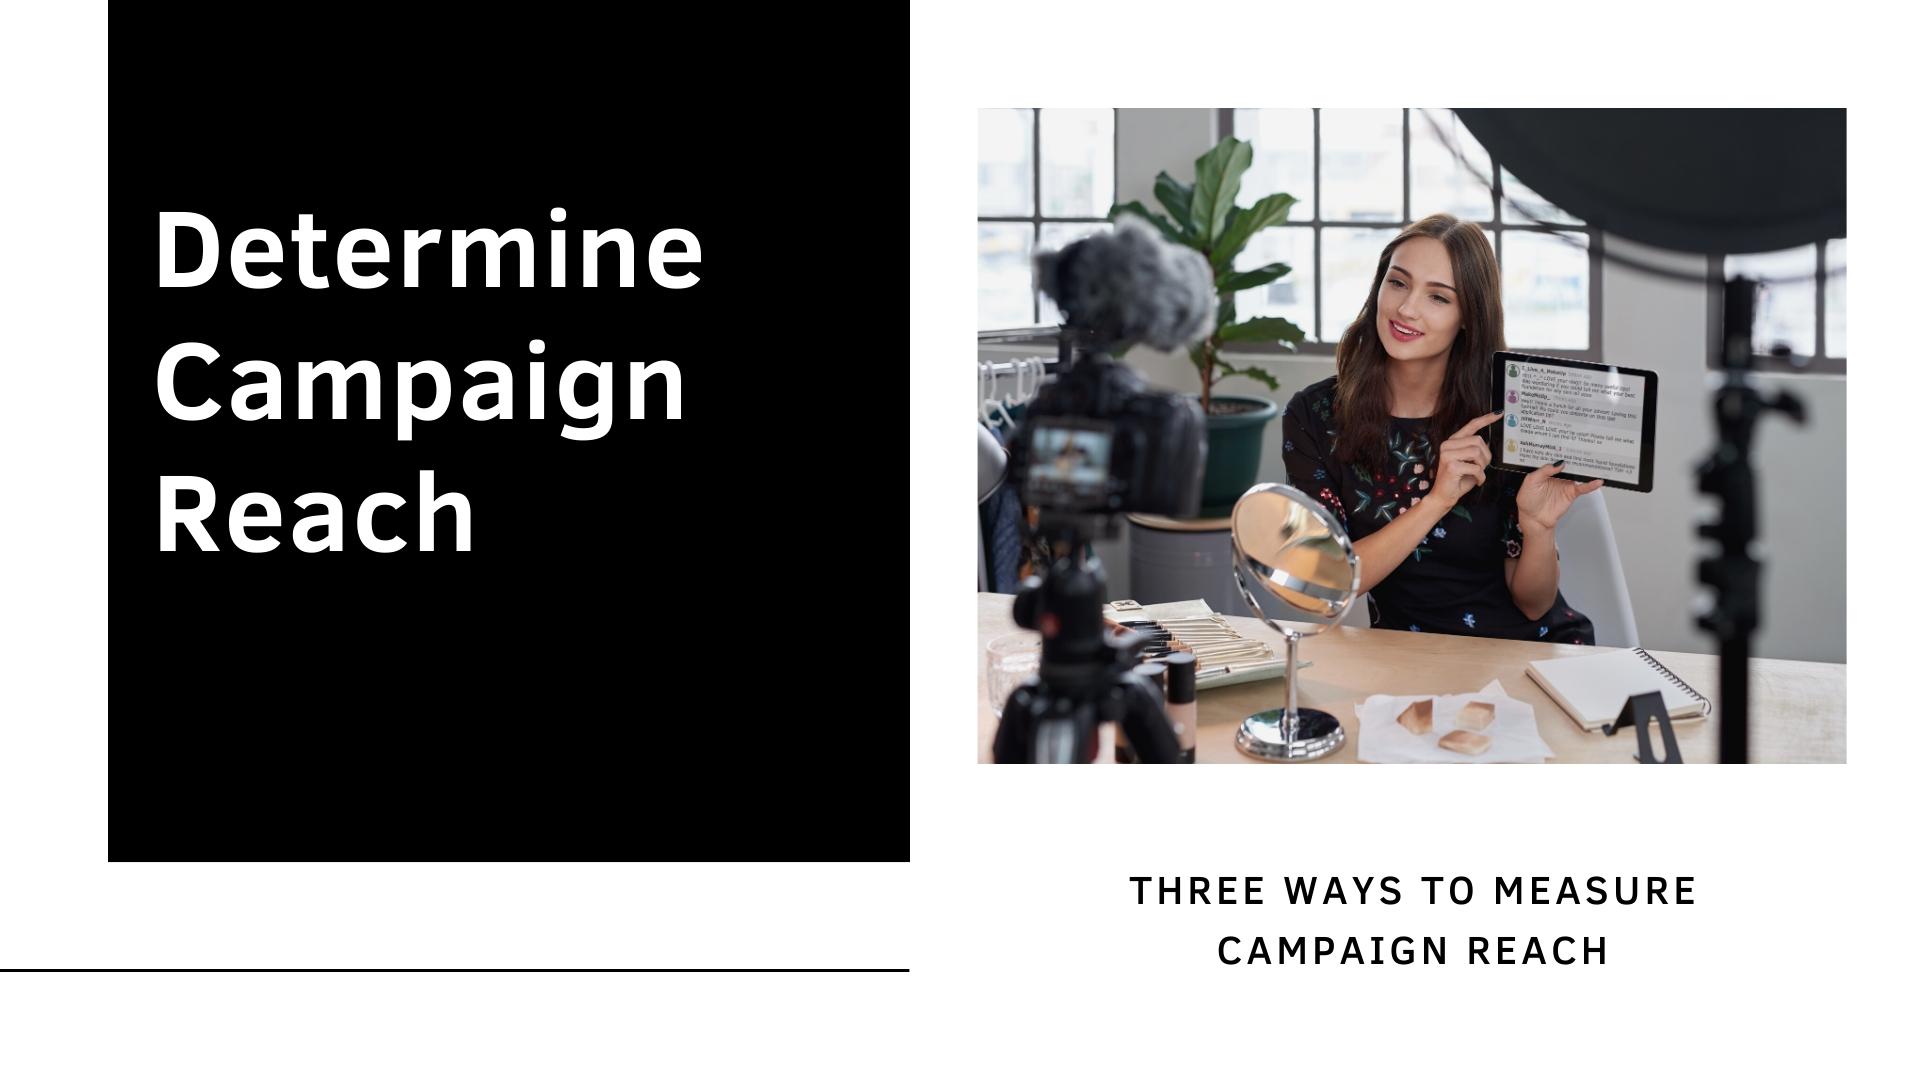 Determine Campaign Reach